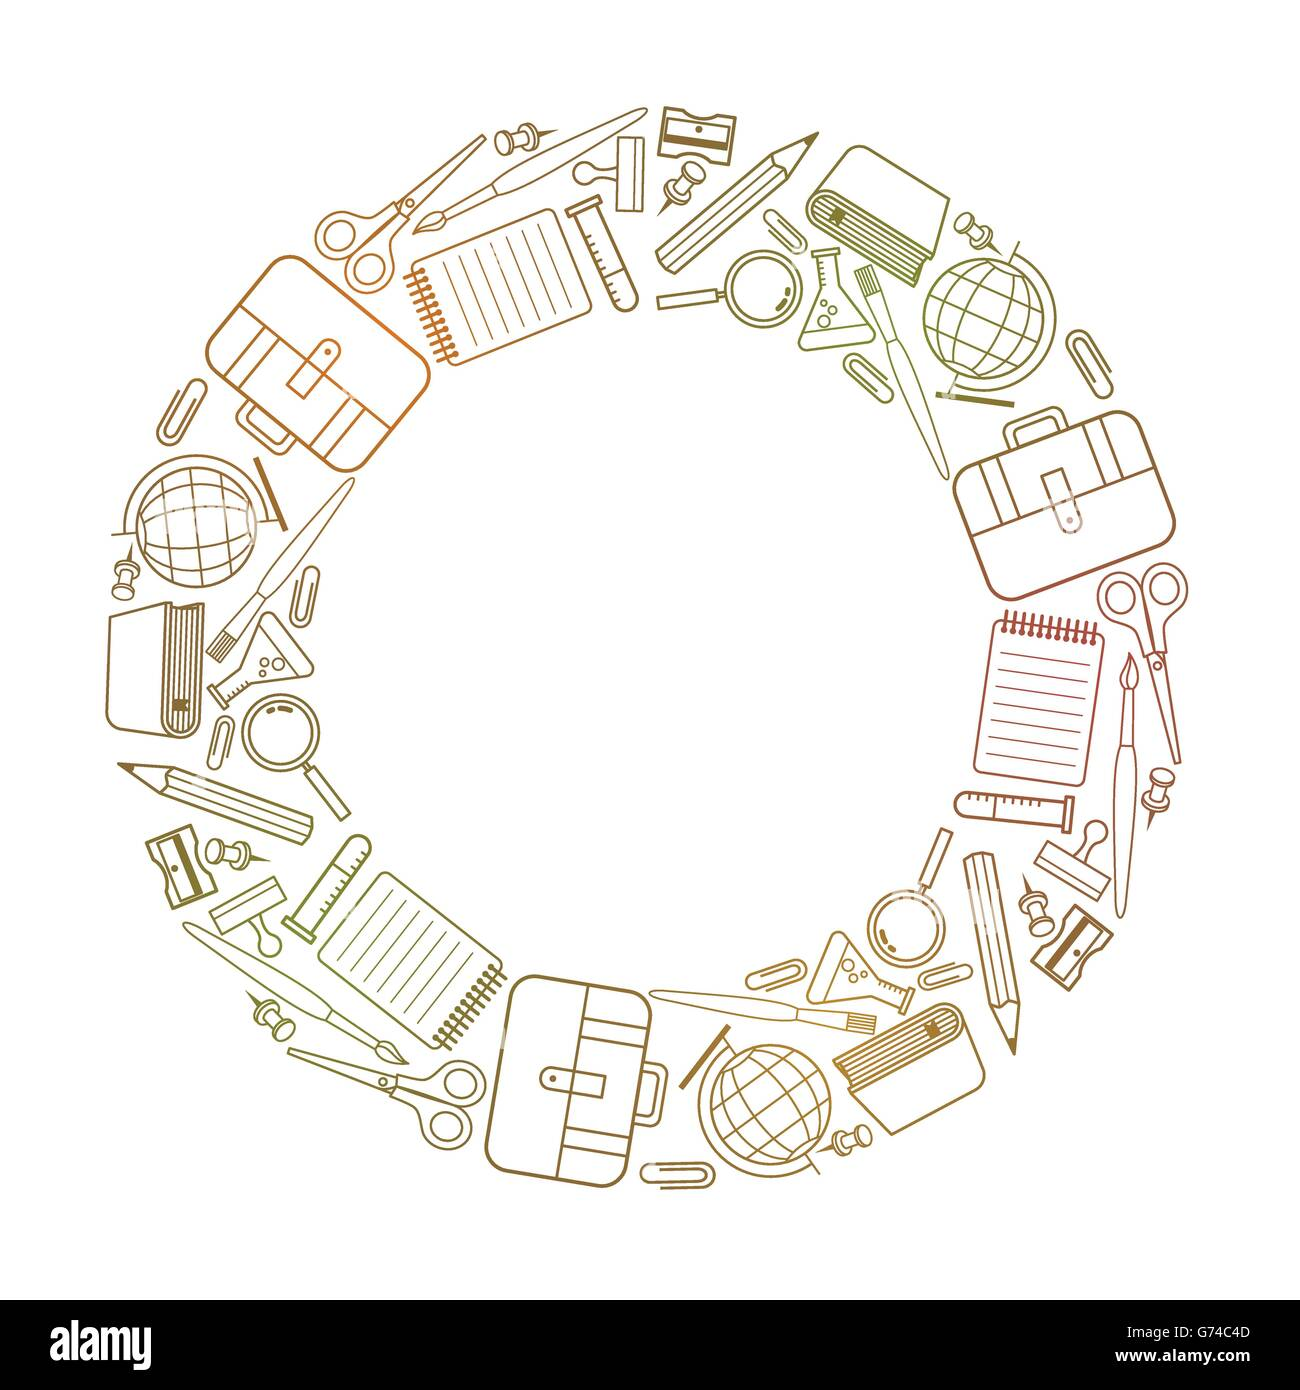 Vektor Rahmen Schule Versorgung-Icons auf faltige Papier Vektor ...